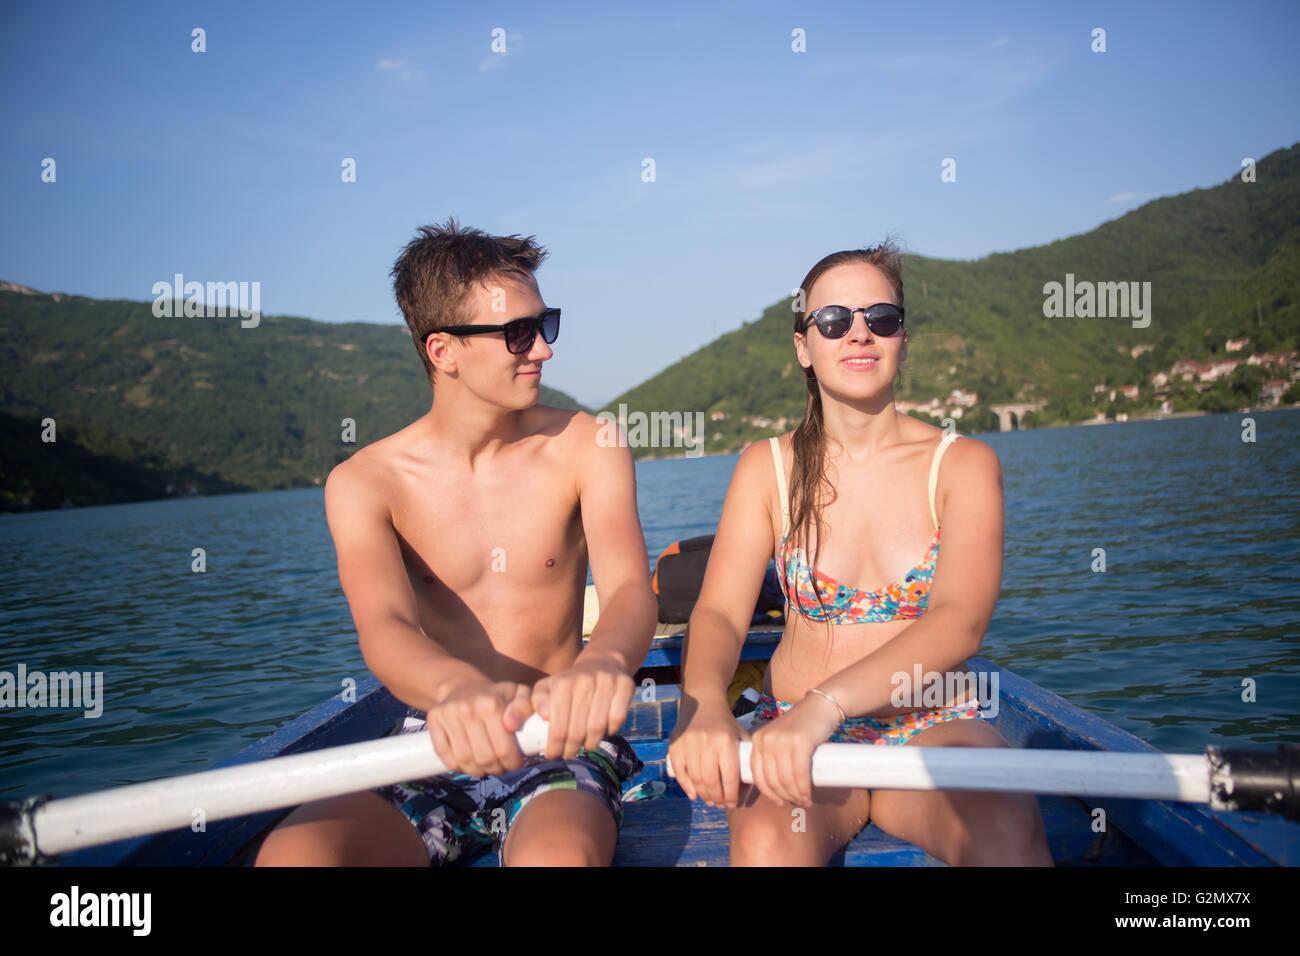 Adventure Happiness Recreational Pursuit Couple Concept - Stock Image